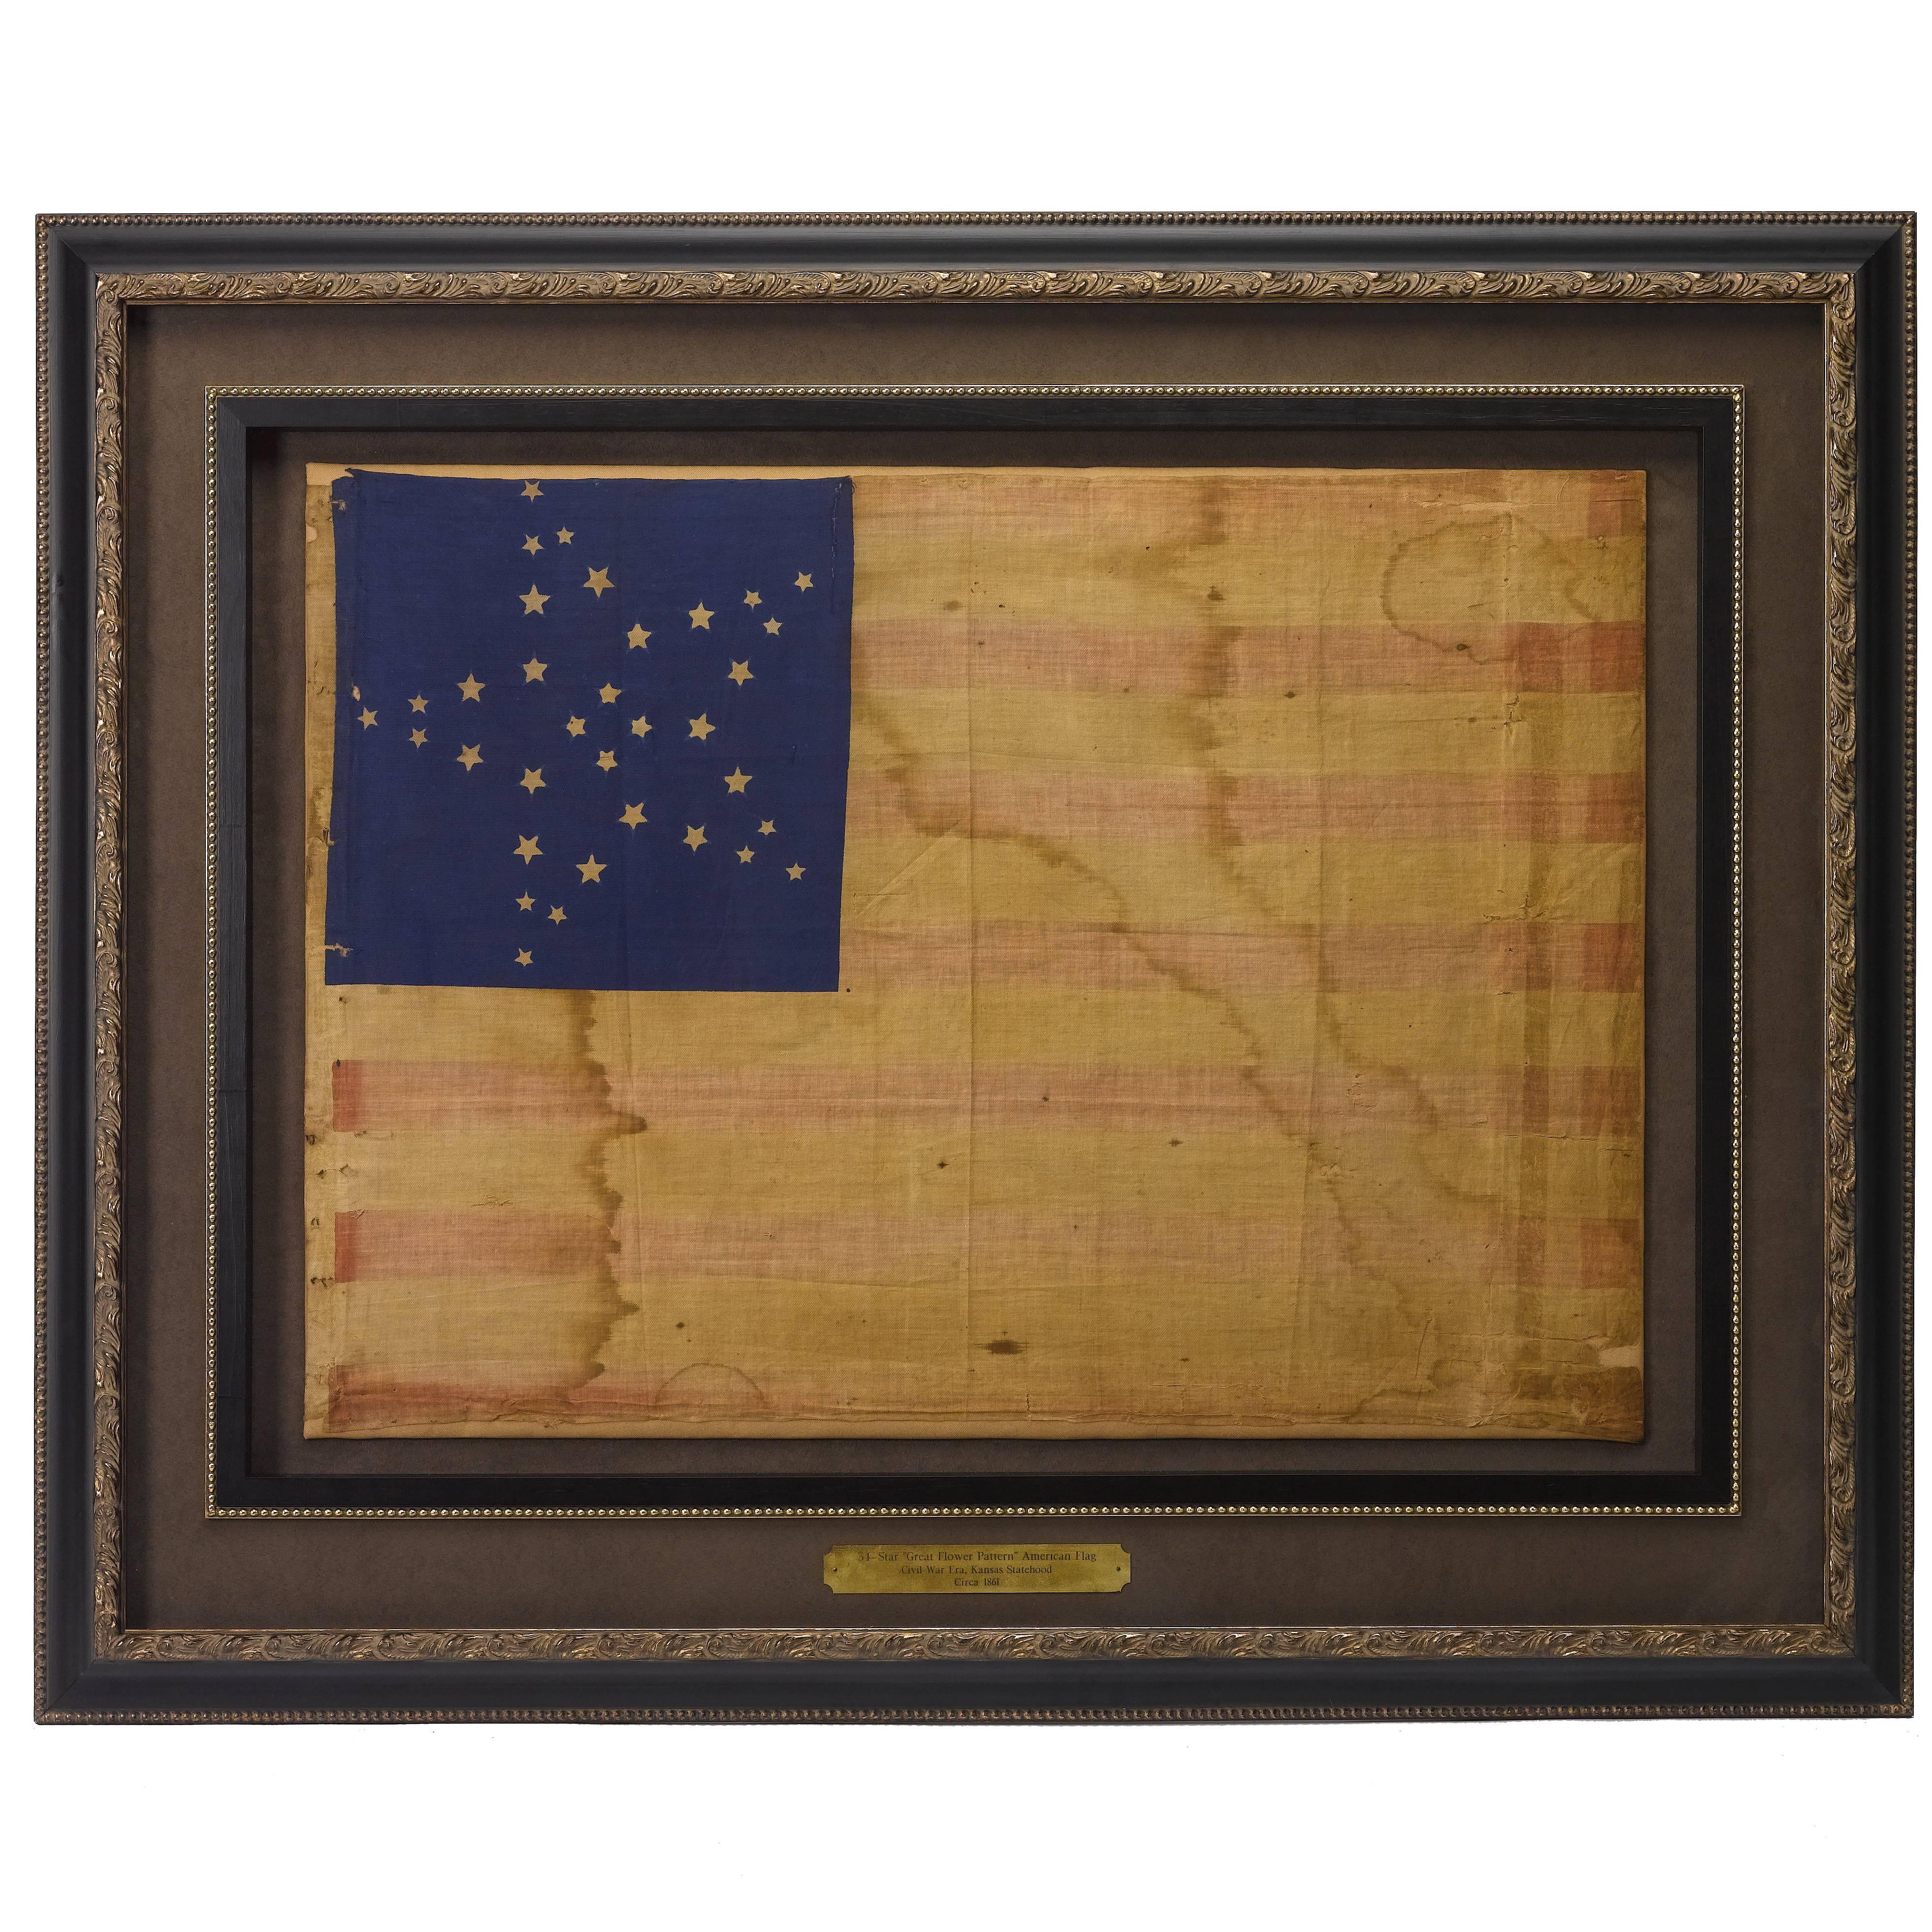 34-Star Civil War American Flag, Antique Great Star Pattern, circa 1861